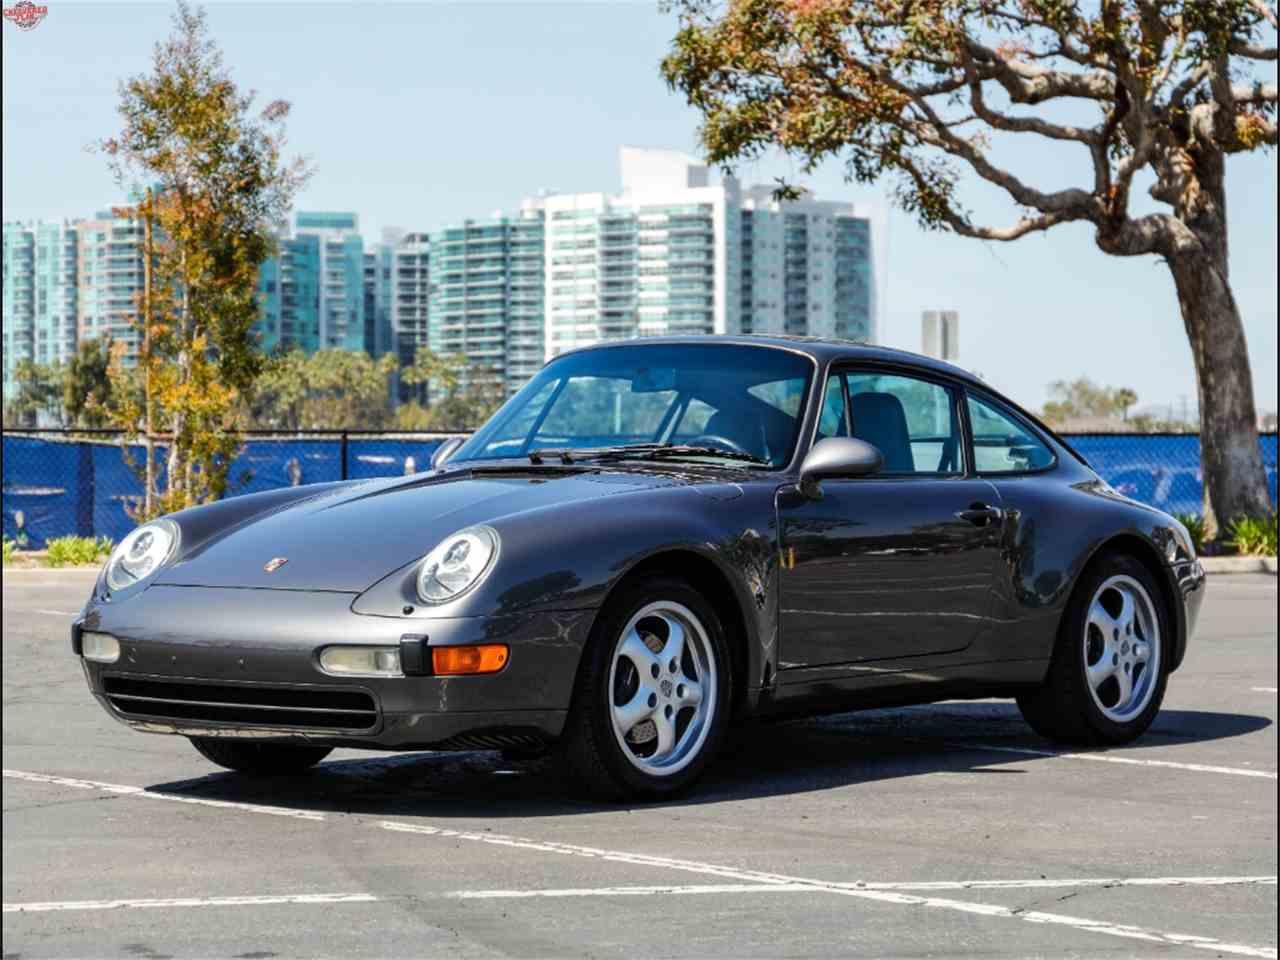 1995 Porsche 993 for Sale | ClicCars.com | CC-1083075 on liberty walk porsche, million-dollar porsche, veilside porsche, little bastard porsche, lifted porsche, rare porsche, strosek porsche, cream porsche, rwd porsche,